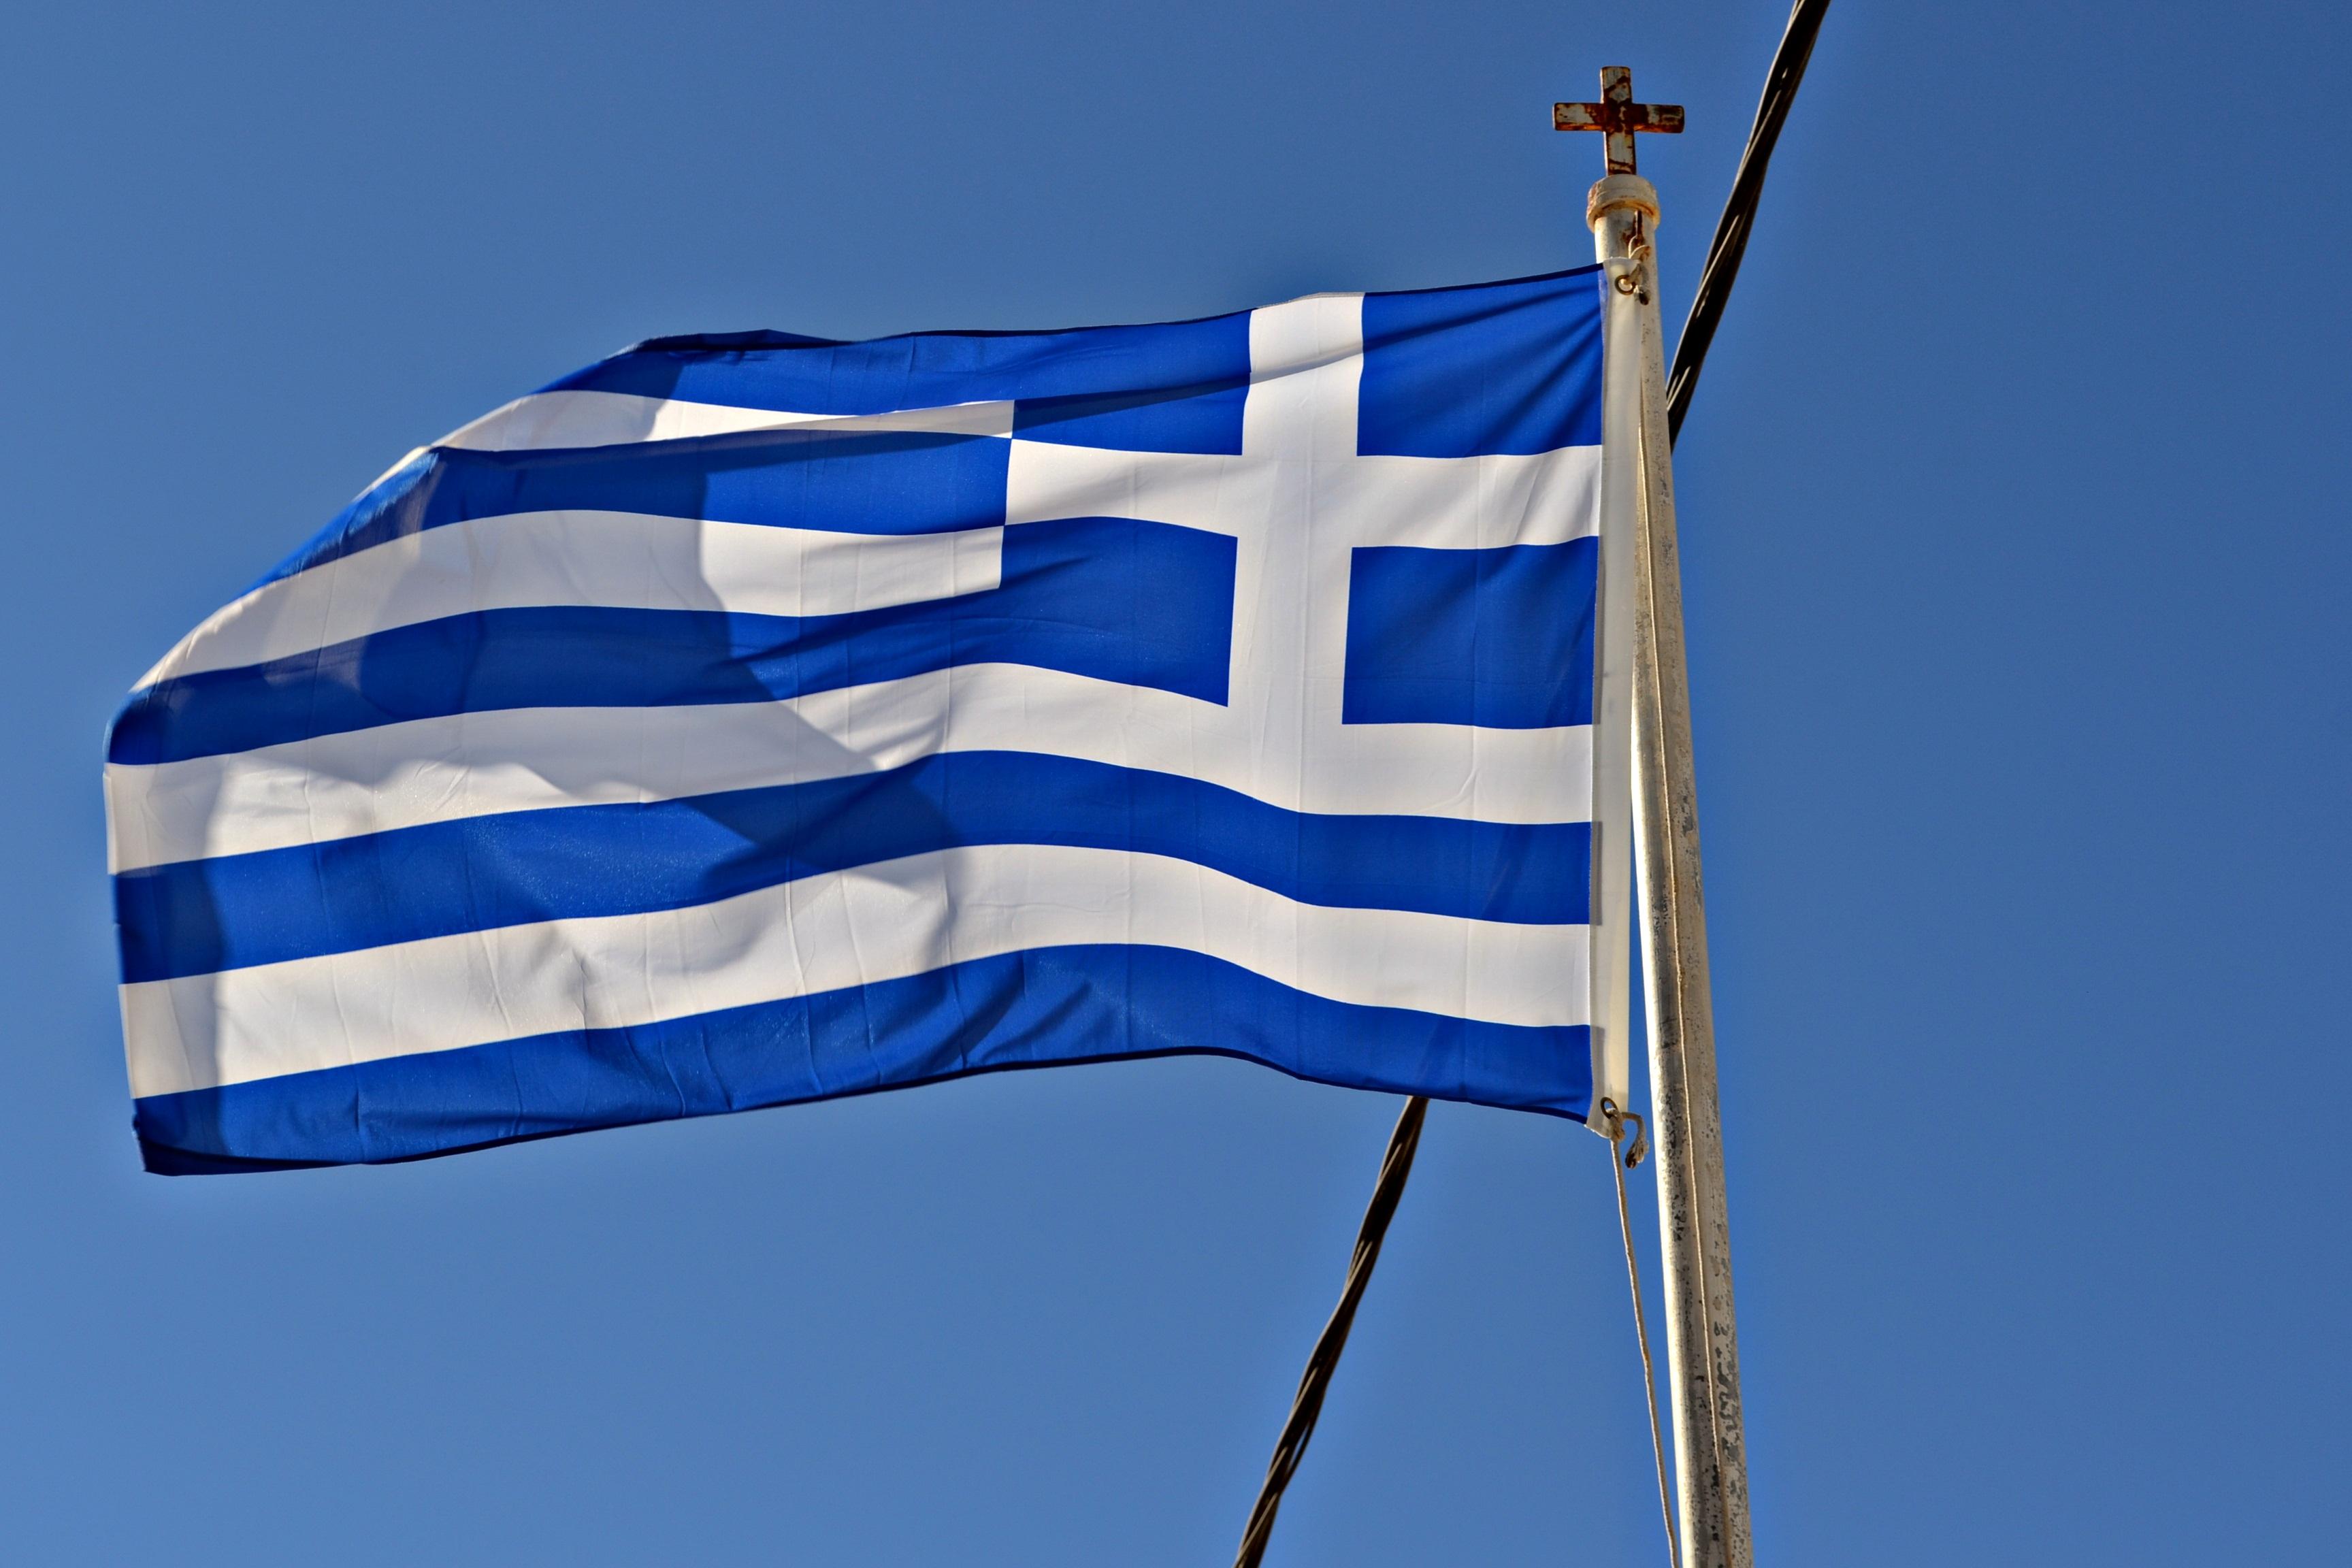 Economia grega surpreende e cresce 0,8% no segundo trimestre